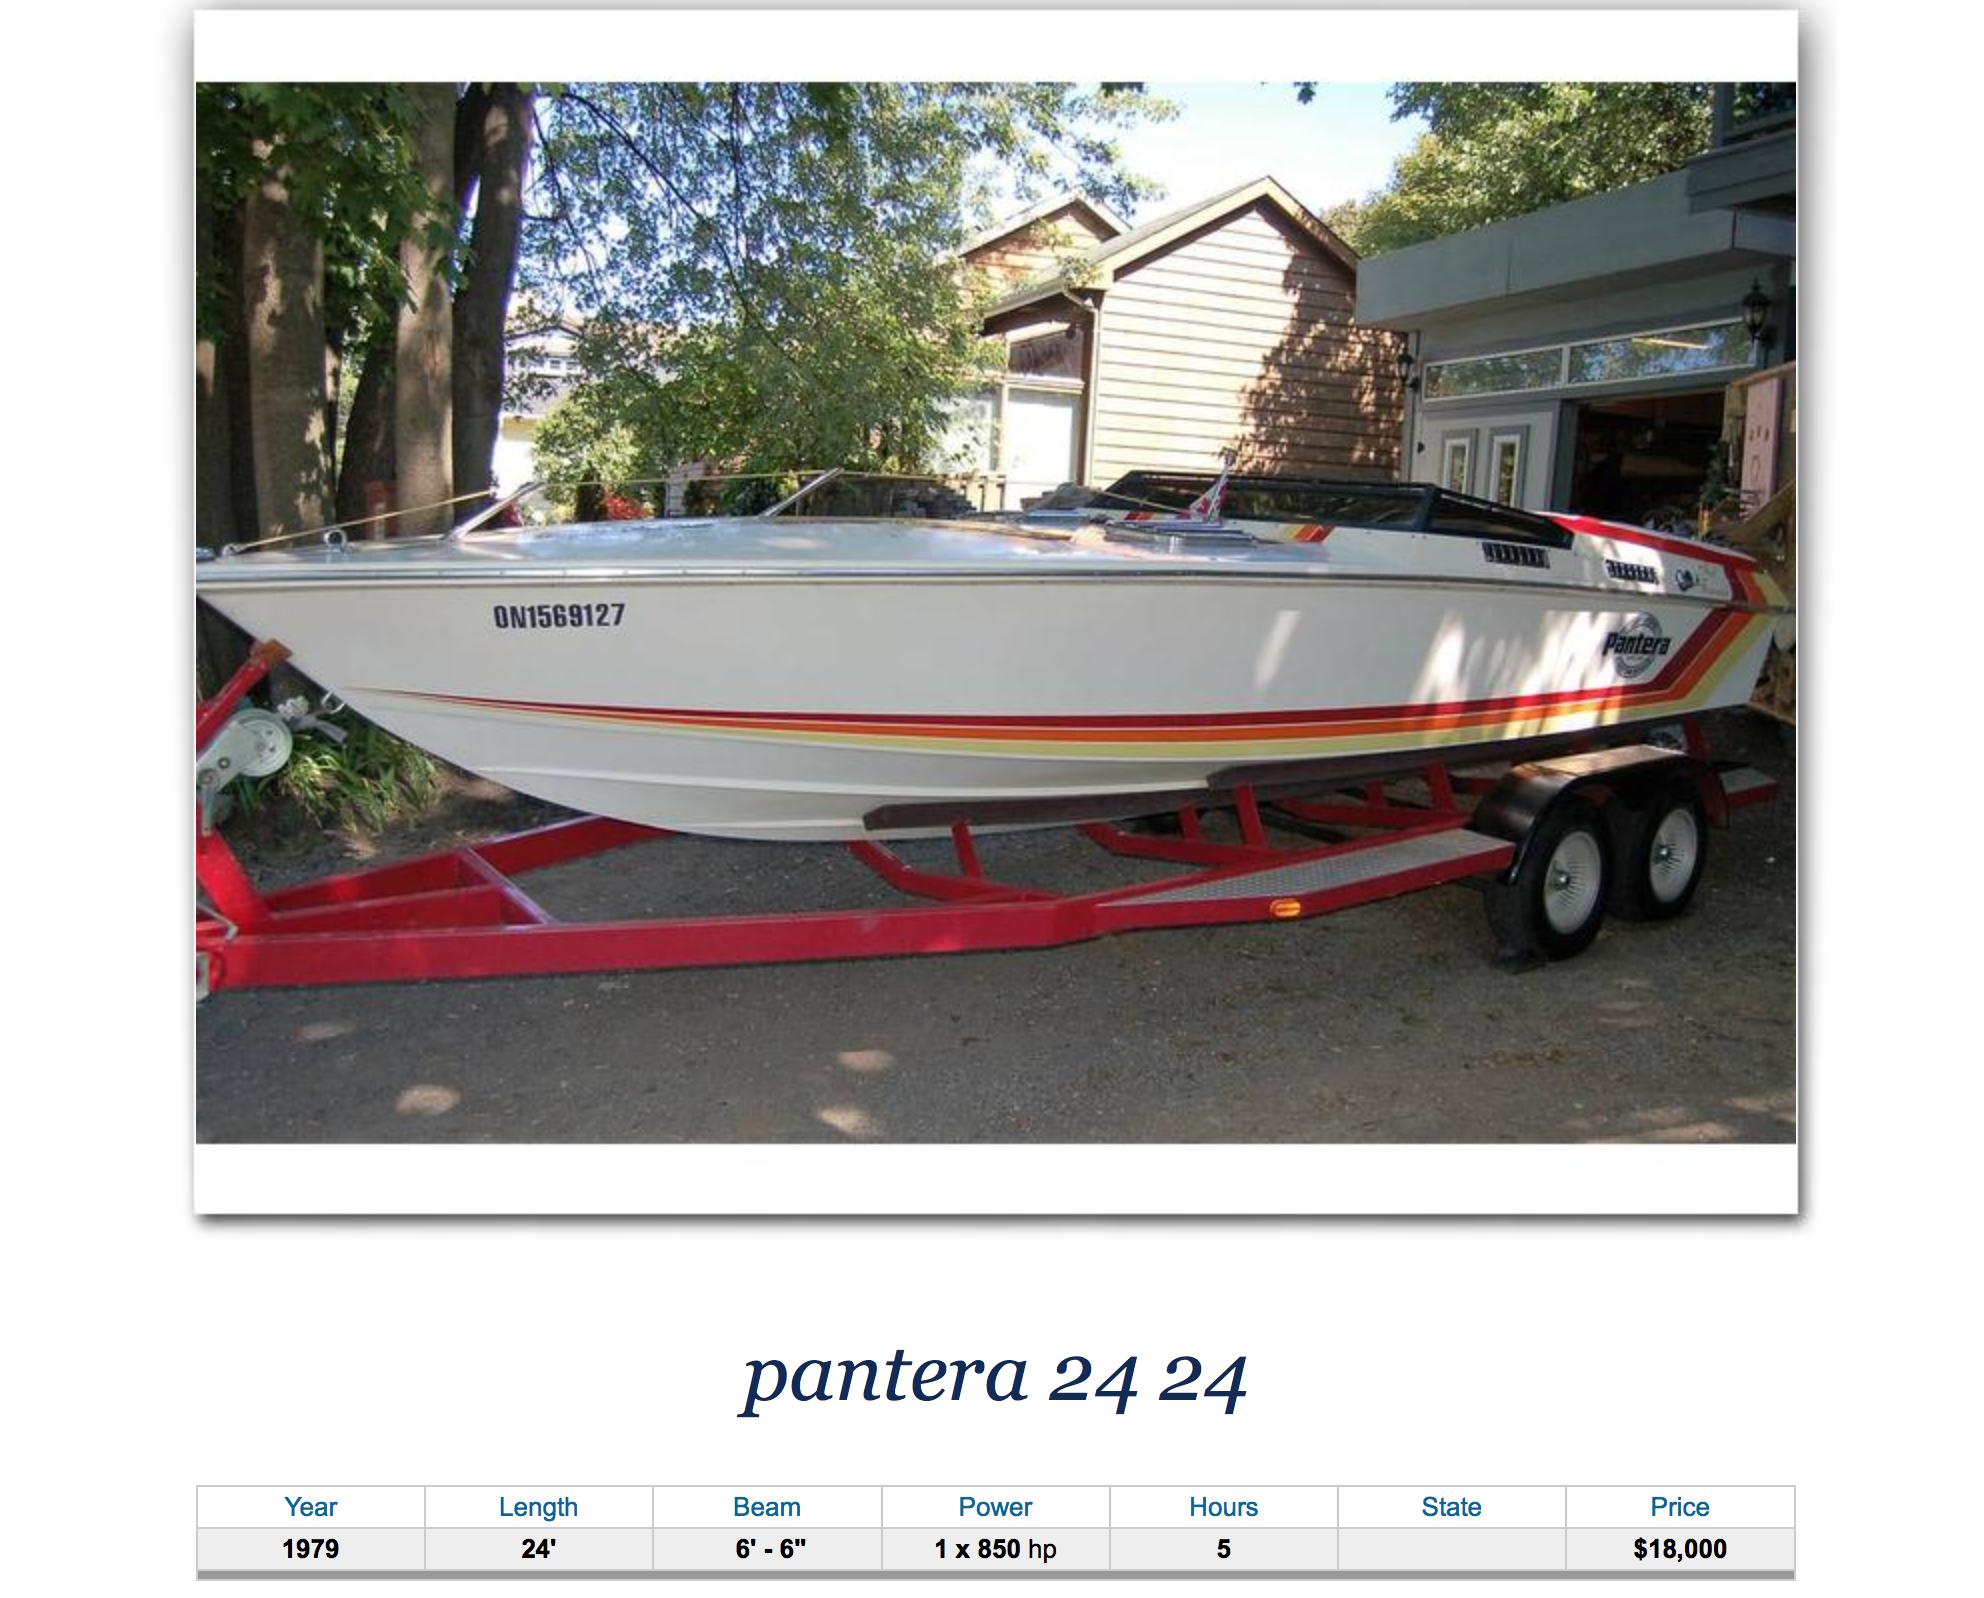 Pantera 24